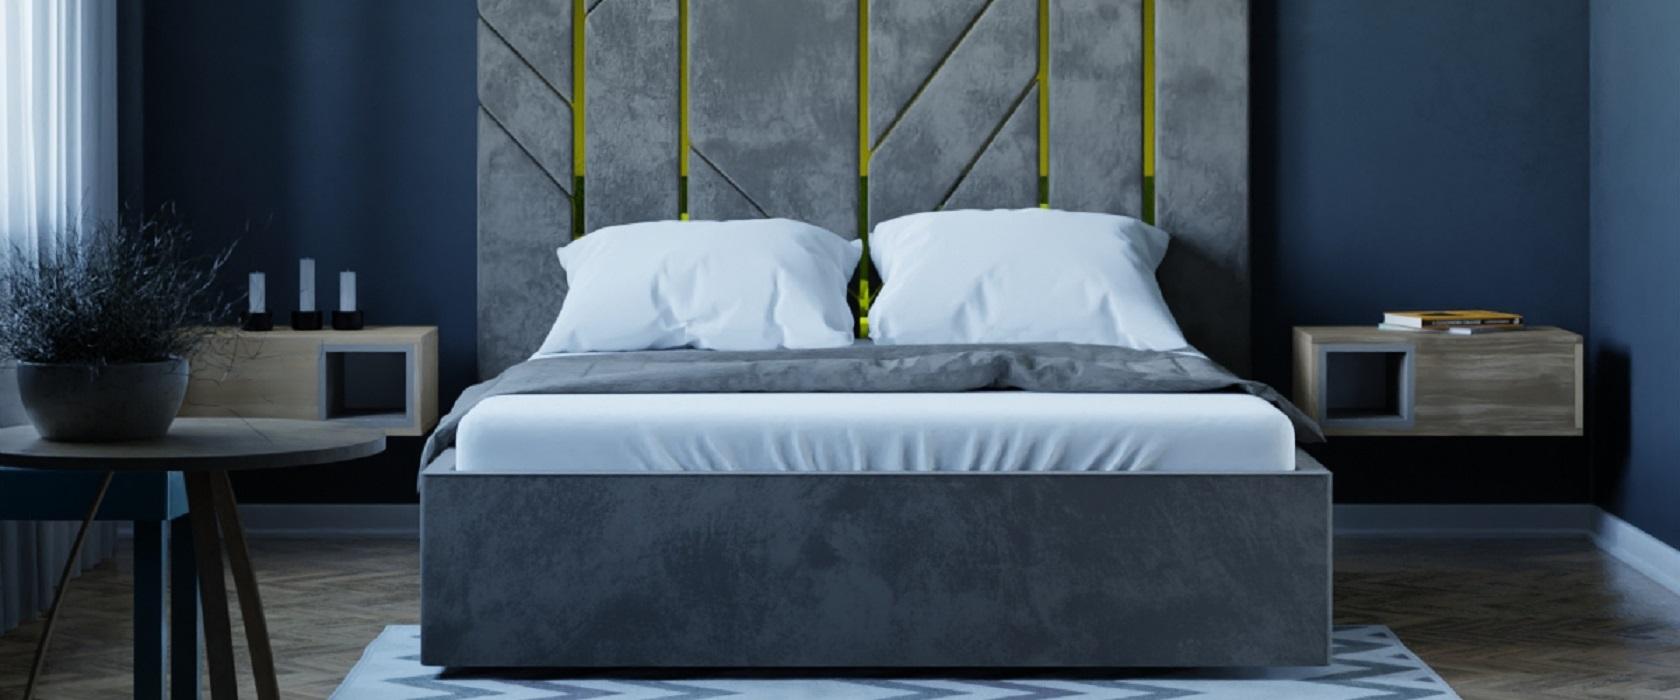 Кровать Letizia - Фото 2 - Pufetto